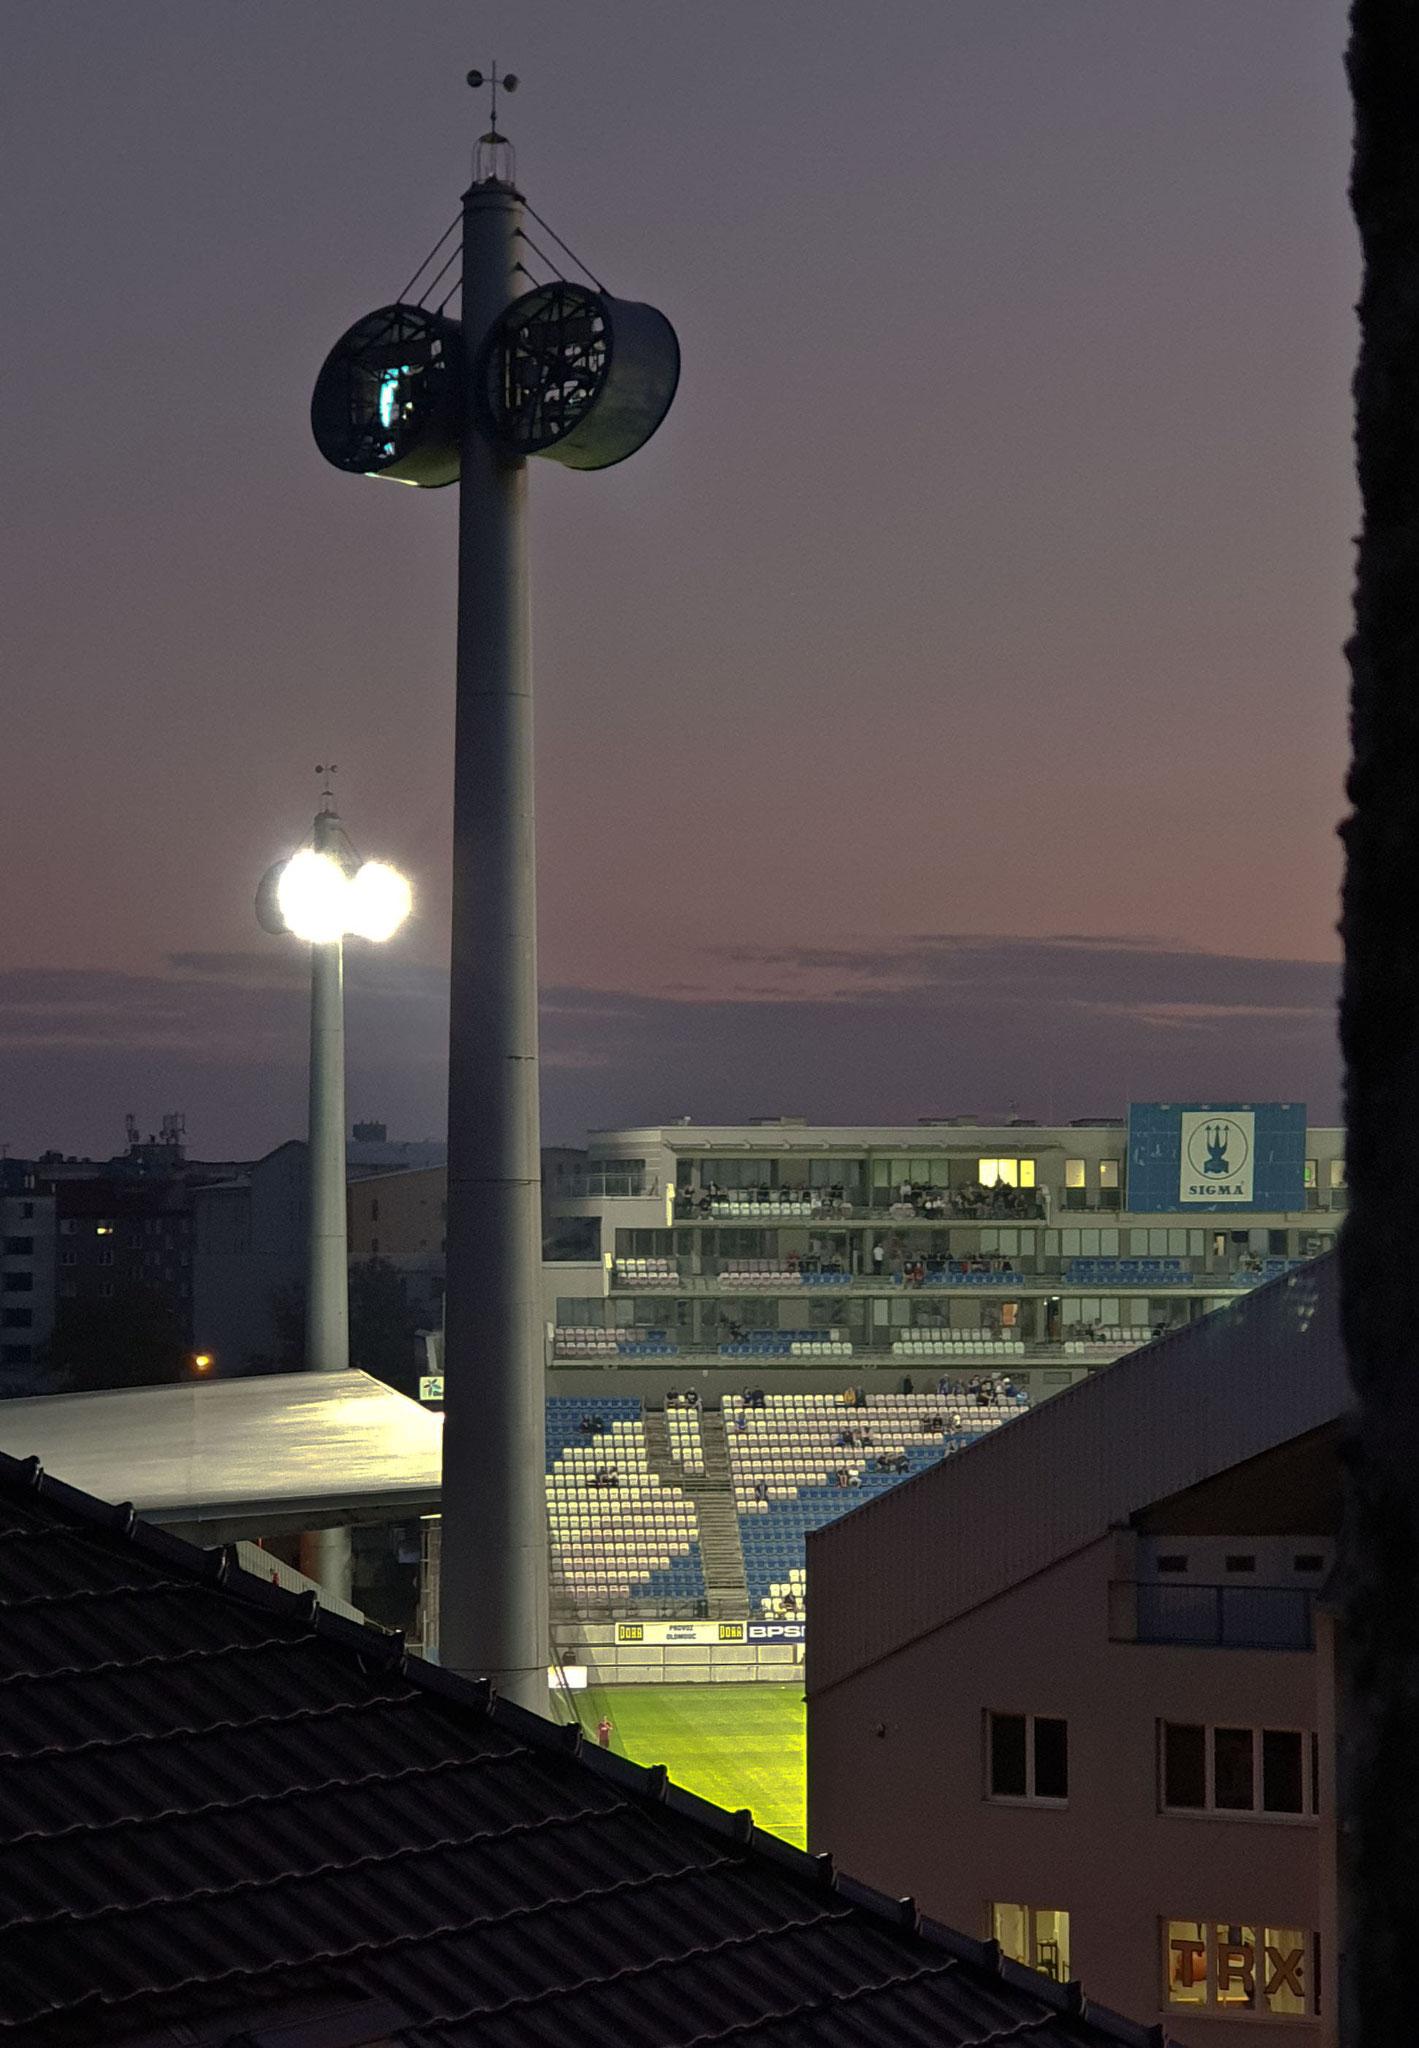 Olomouc, im Stadion gab es Fußball